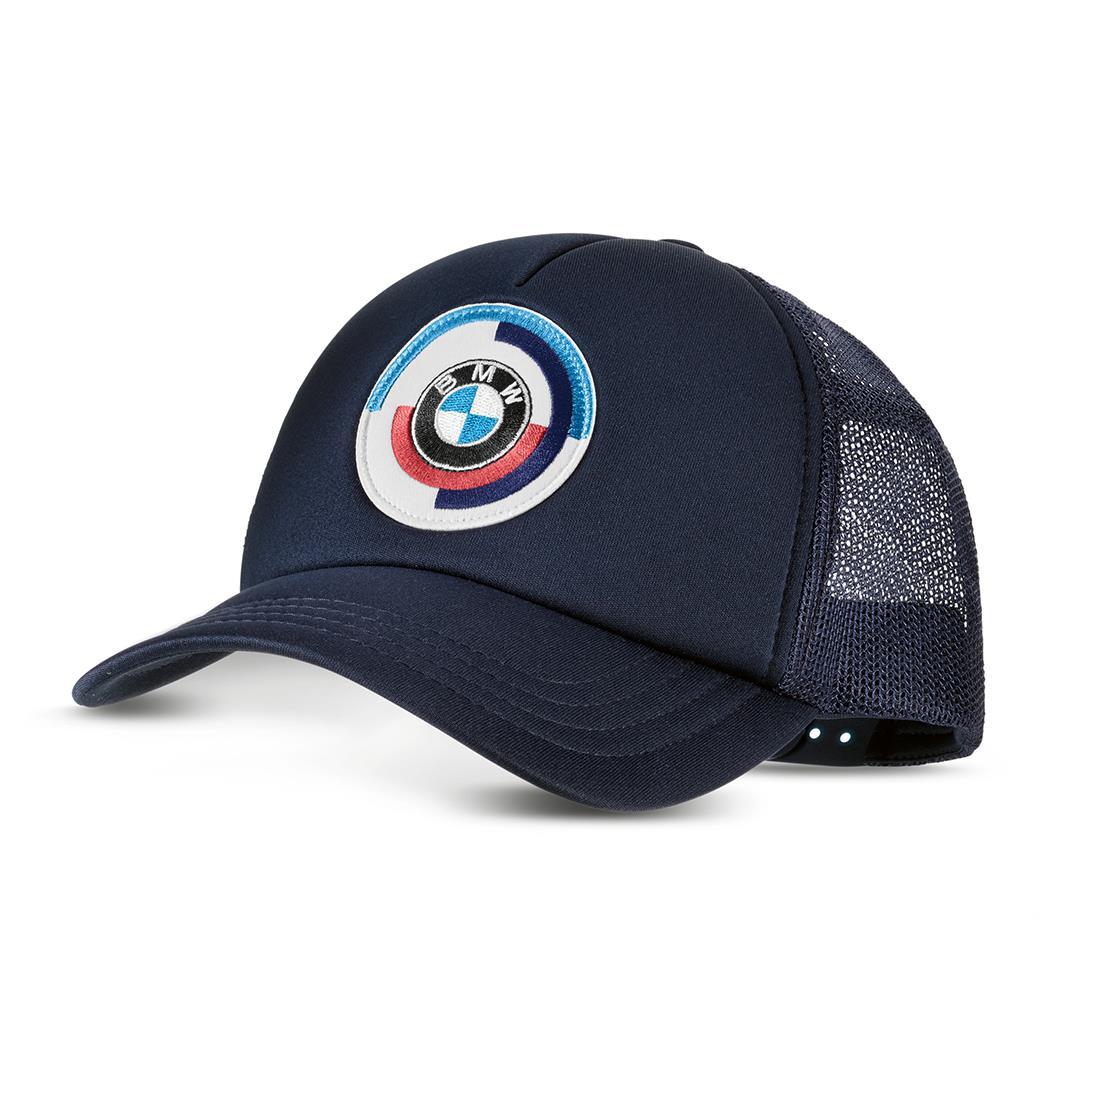 BMW Classic Cap, Motorsport